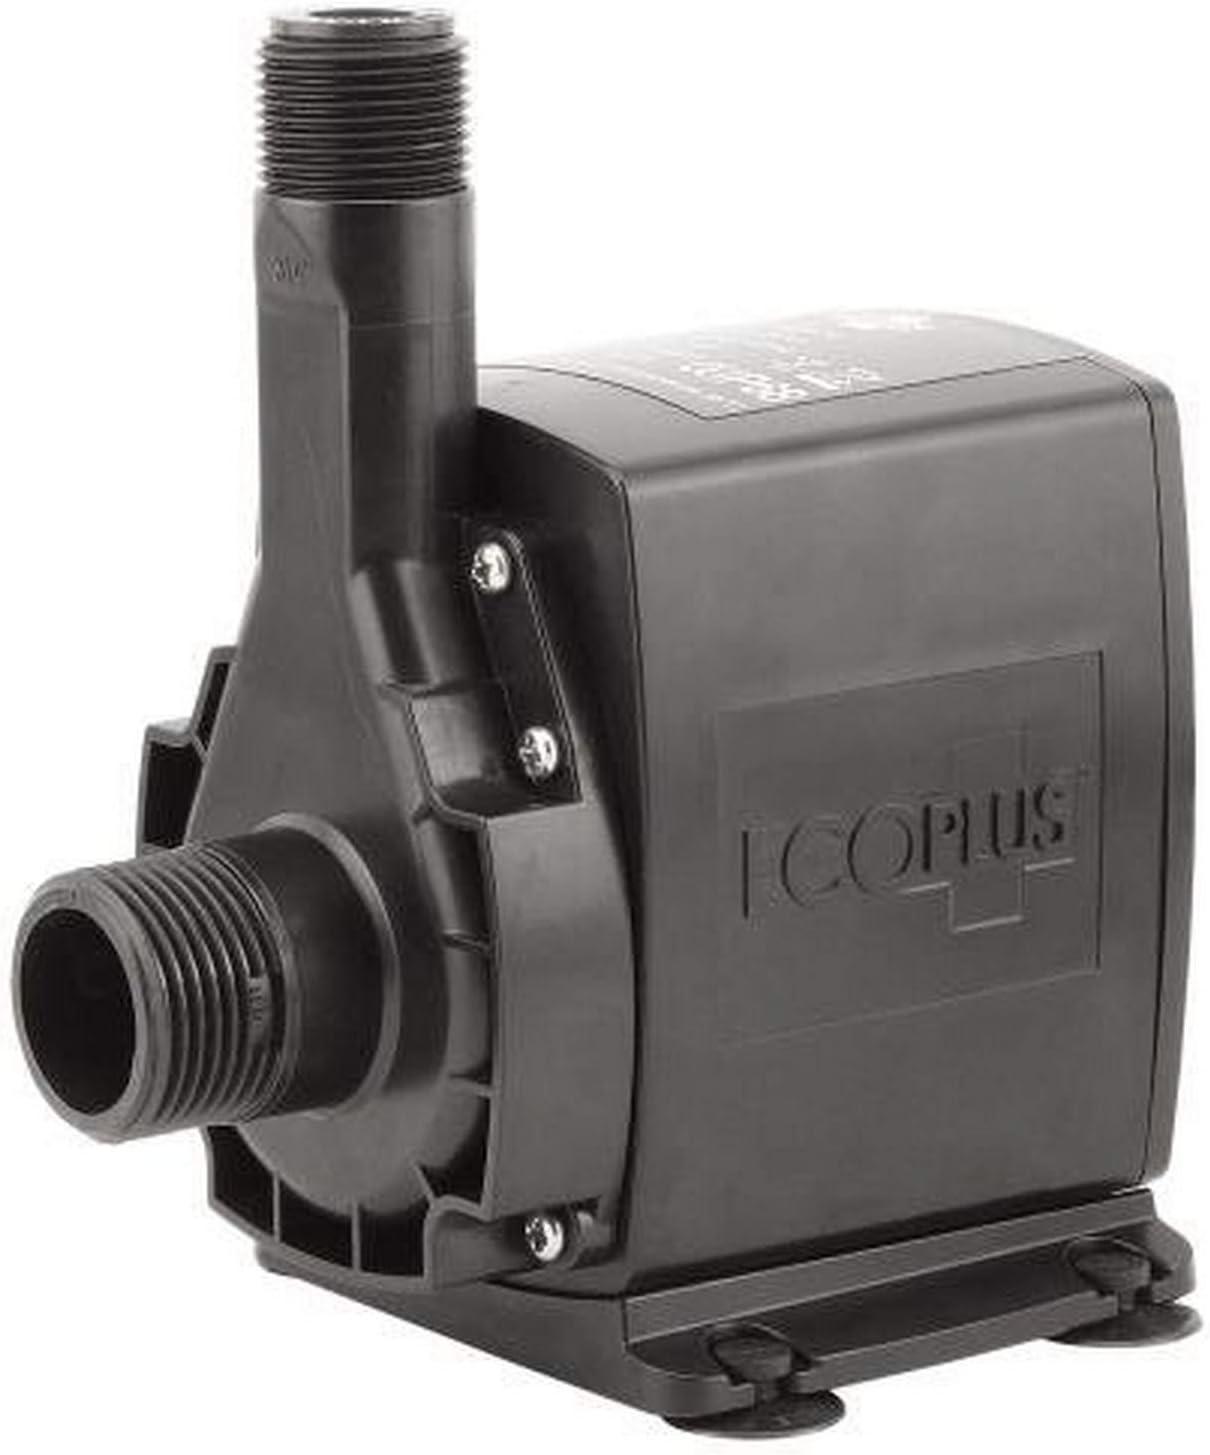 Eco Plus 748465 Submersible Water Pump, 700 GPH, Black